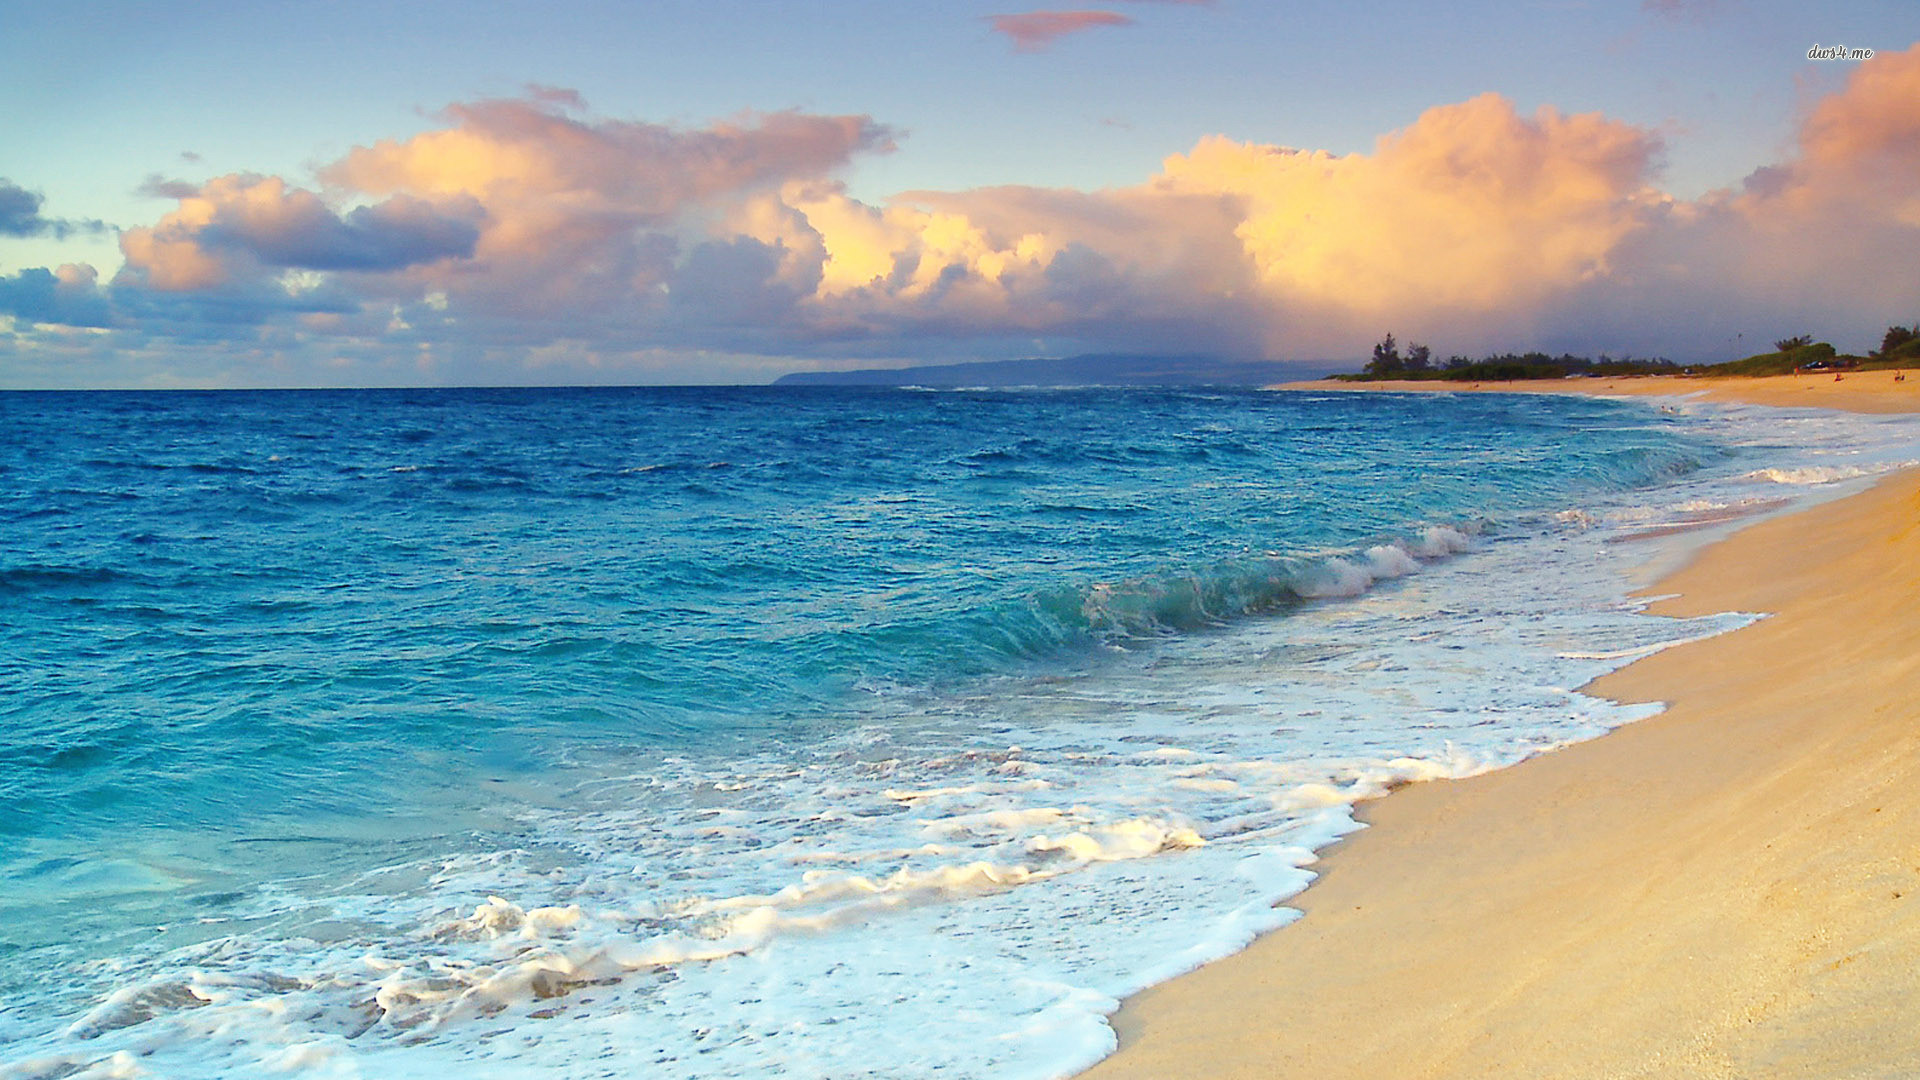 5053-hawaii-beach-1920×1080-beach-wallpaper.jpg